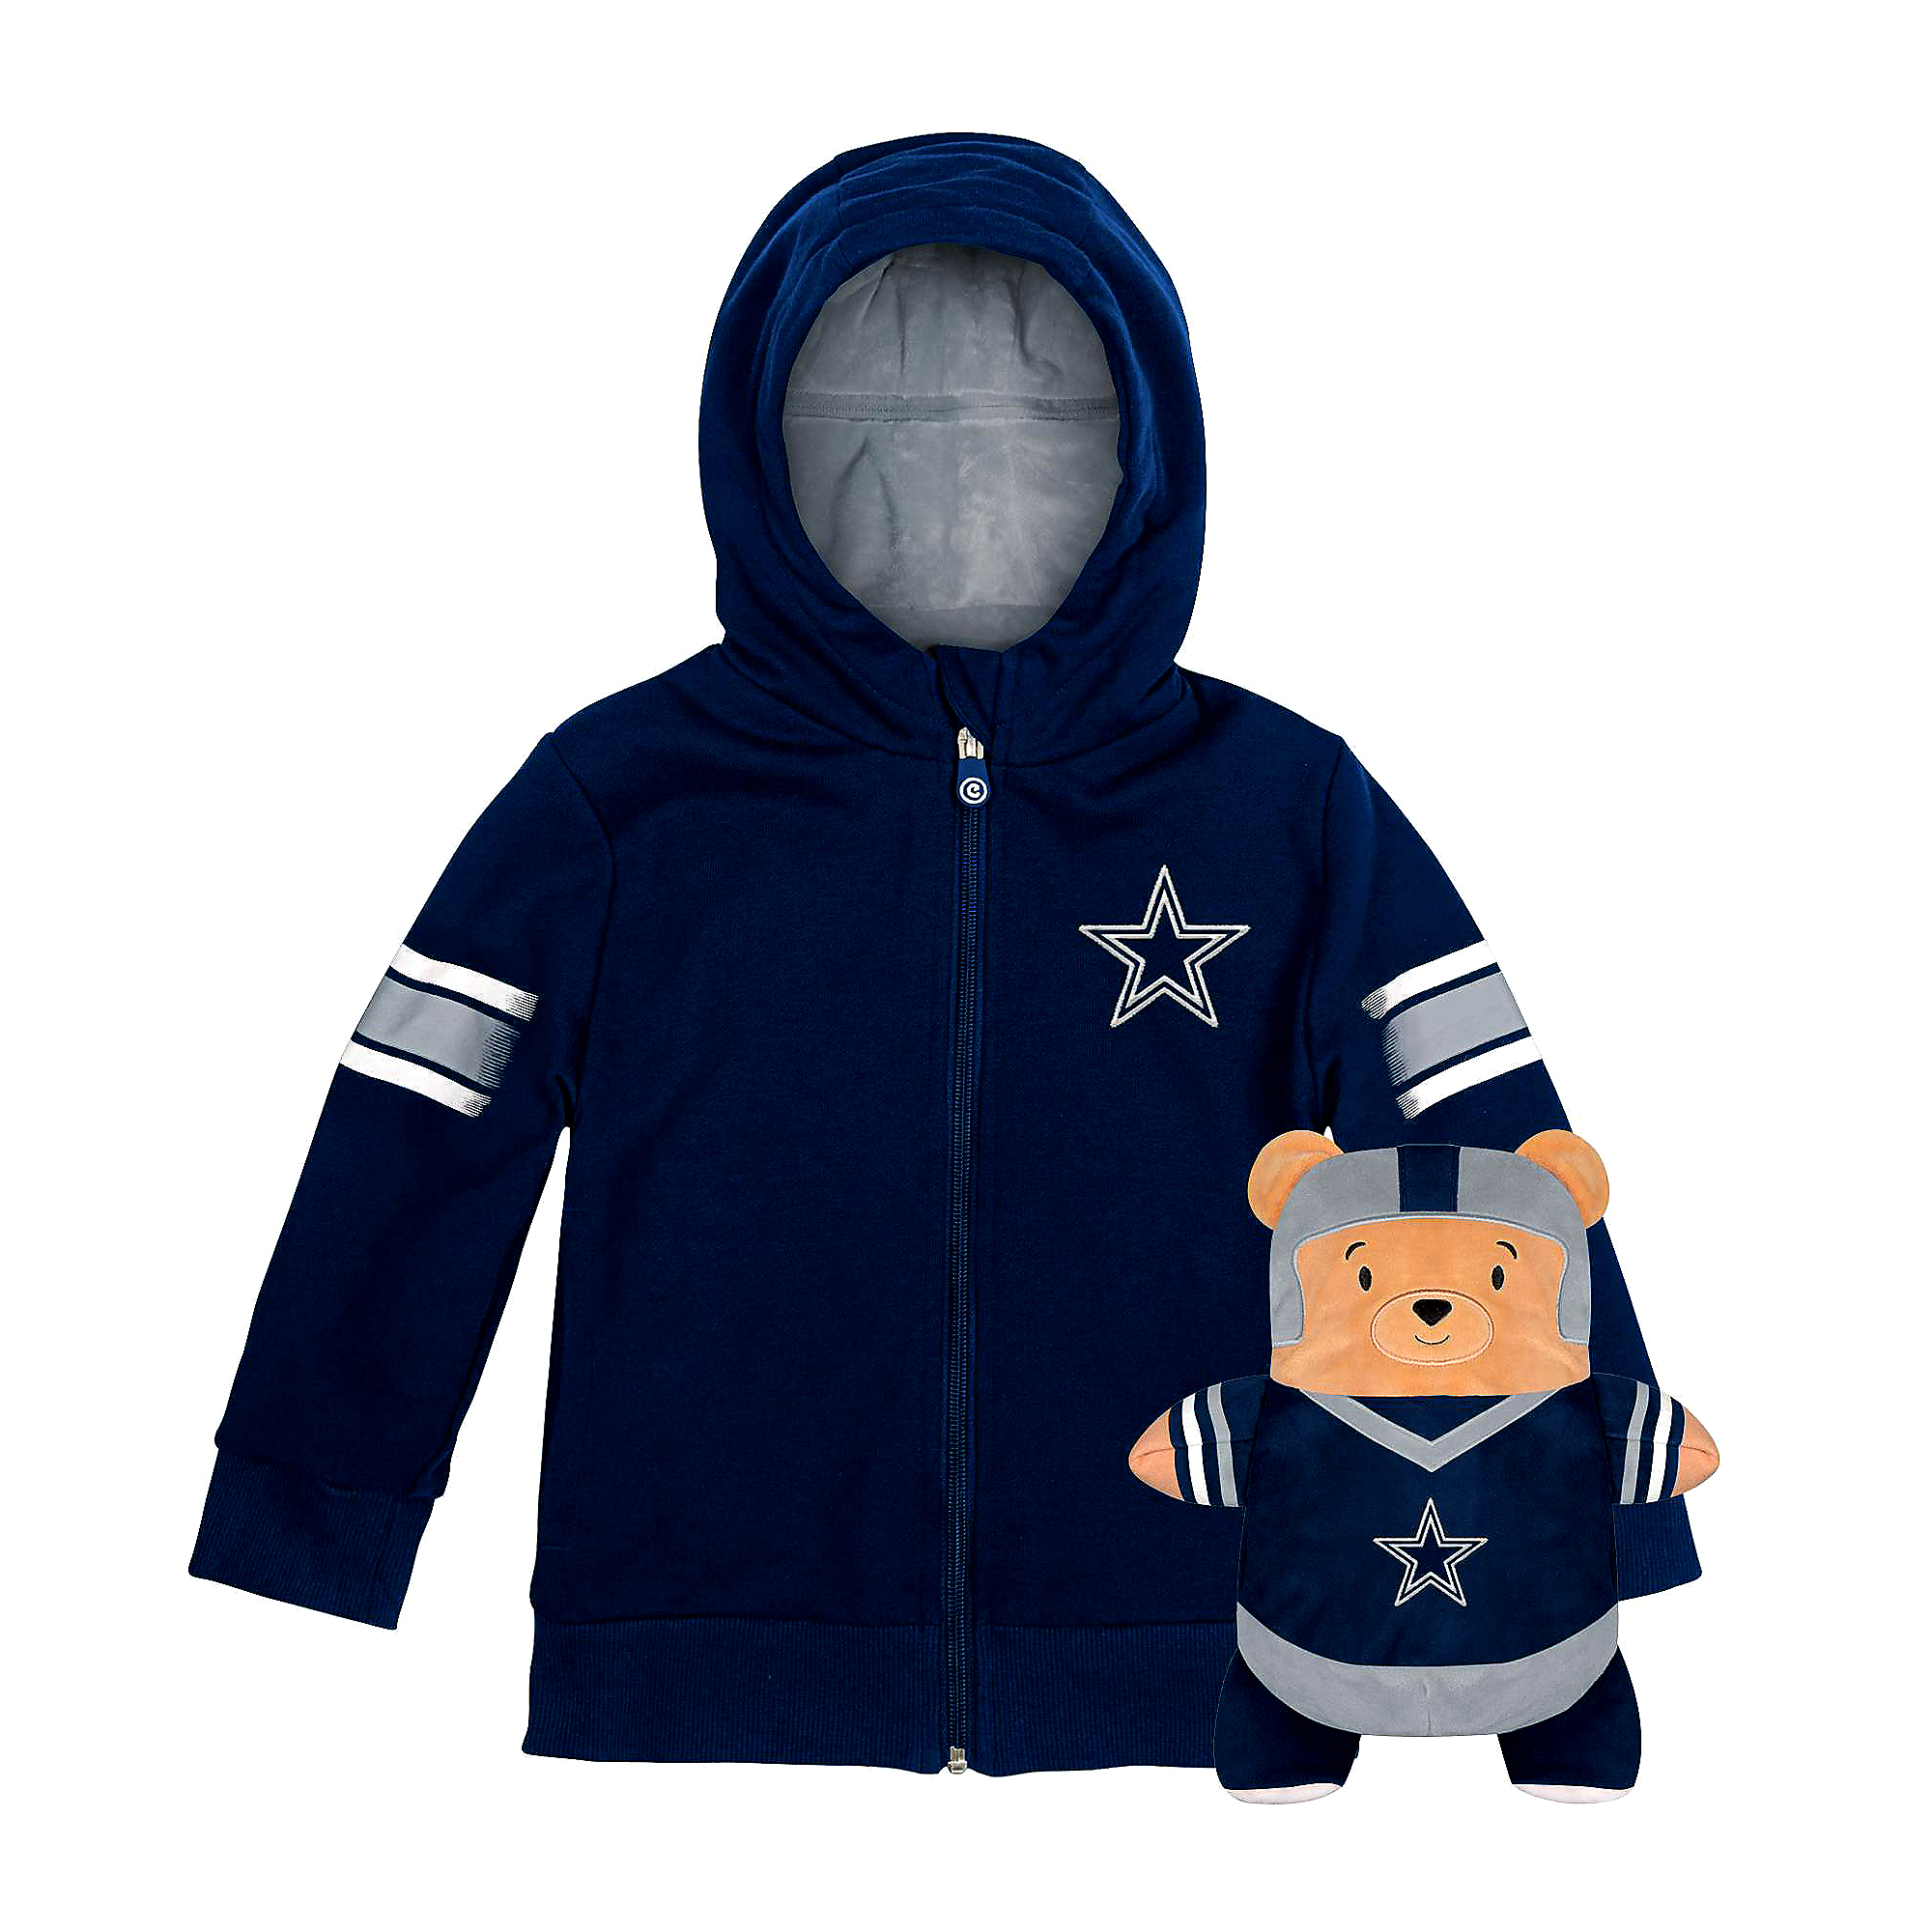 Dallas Cowboys Youth Team Mascot Cubcoat Plush Hoodie